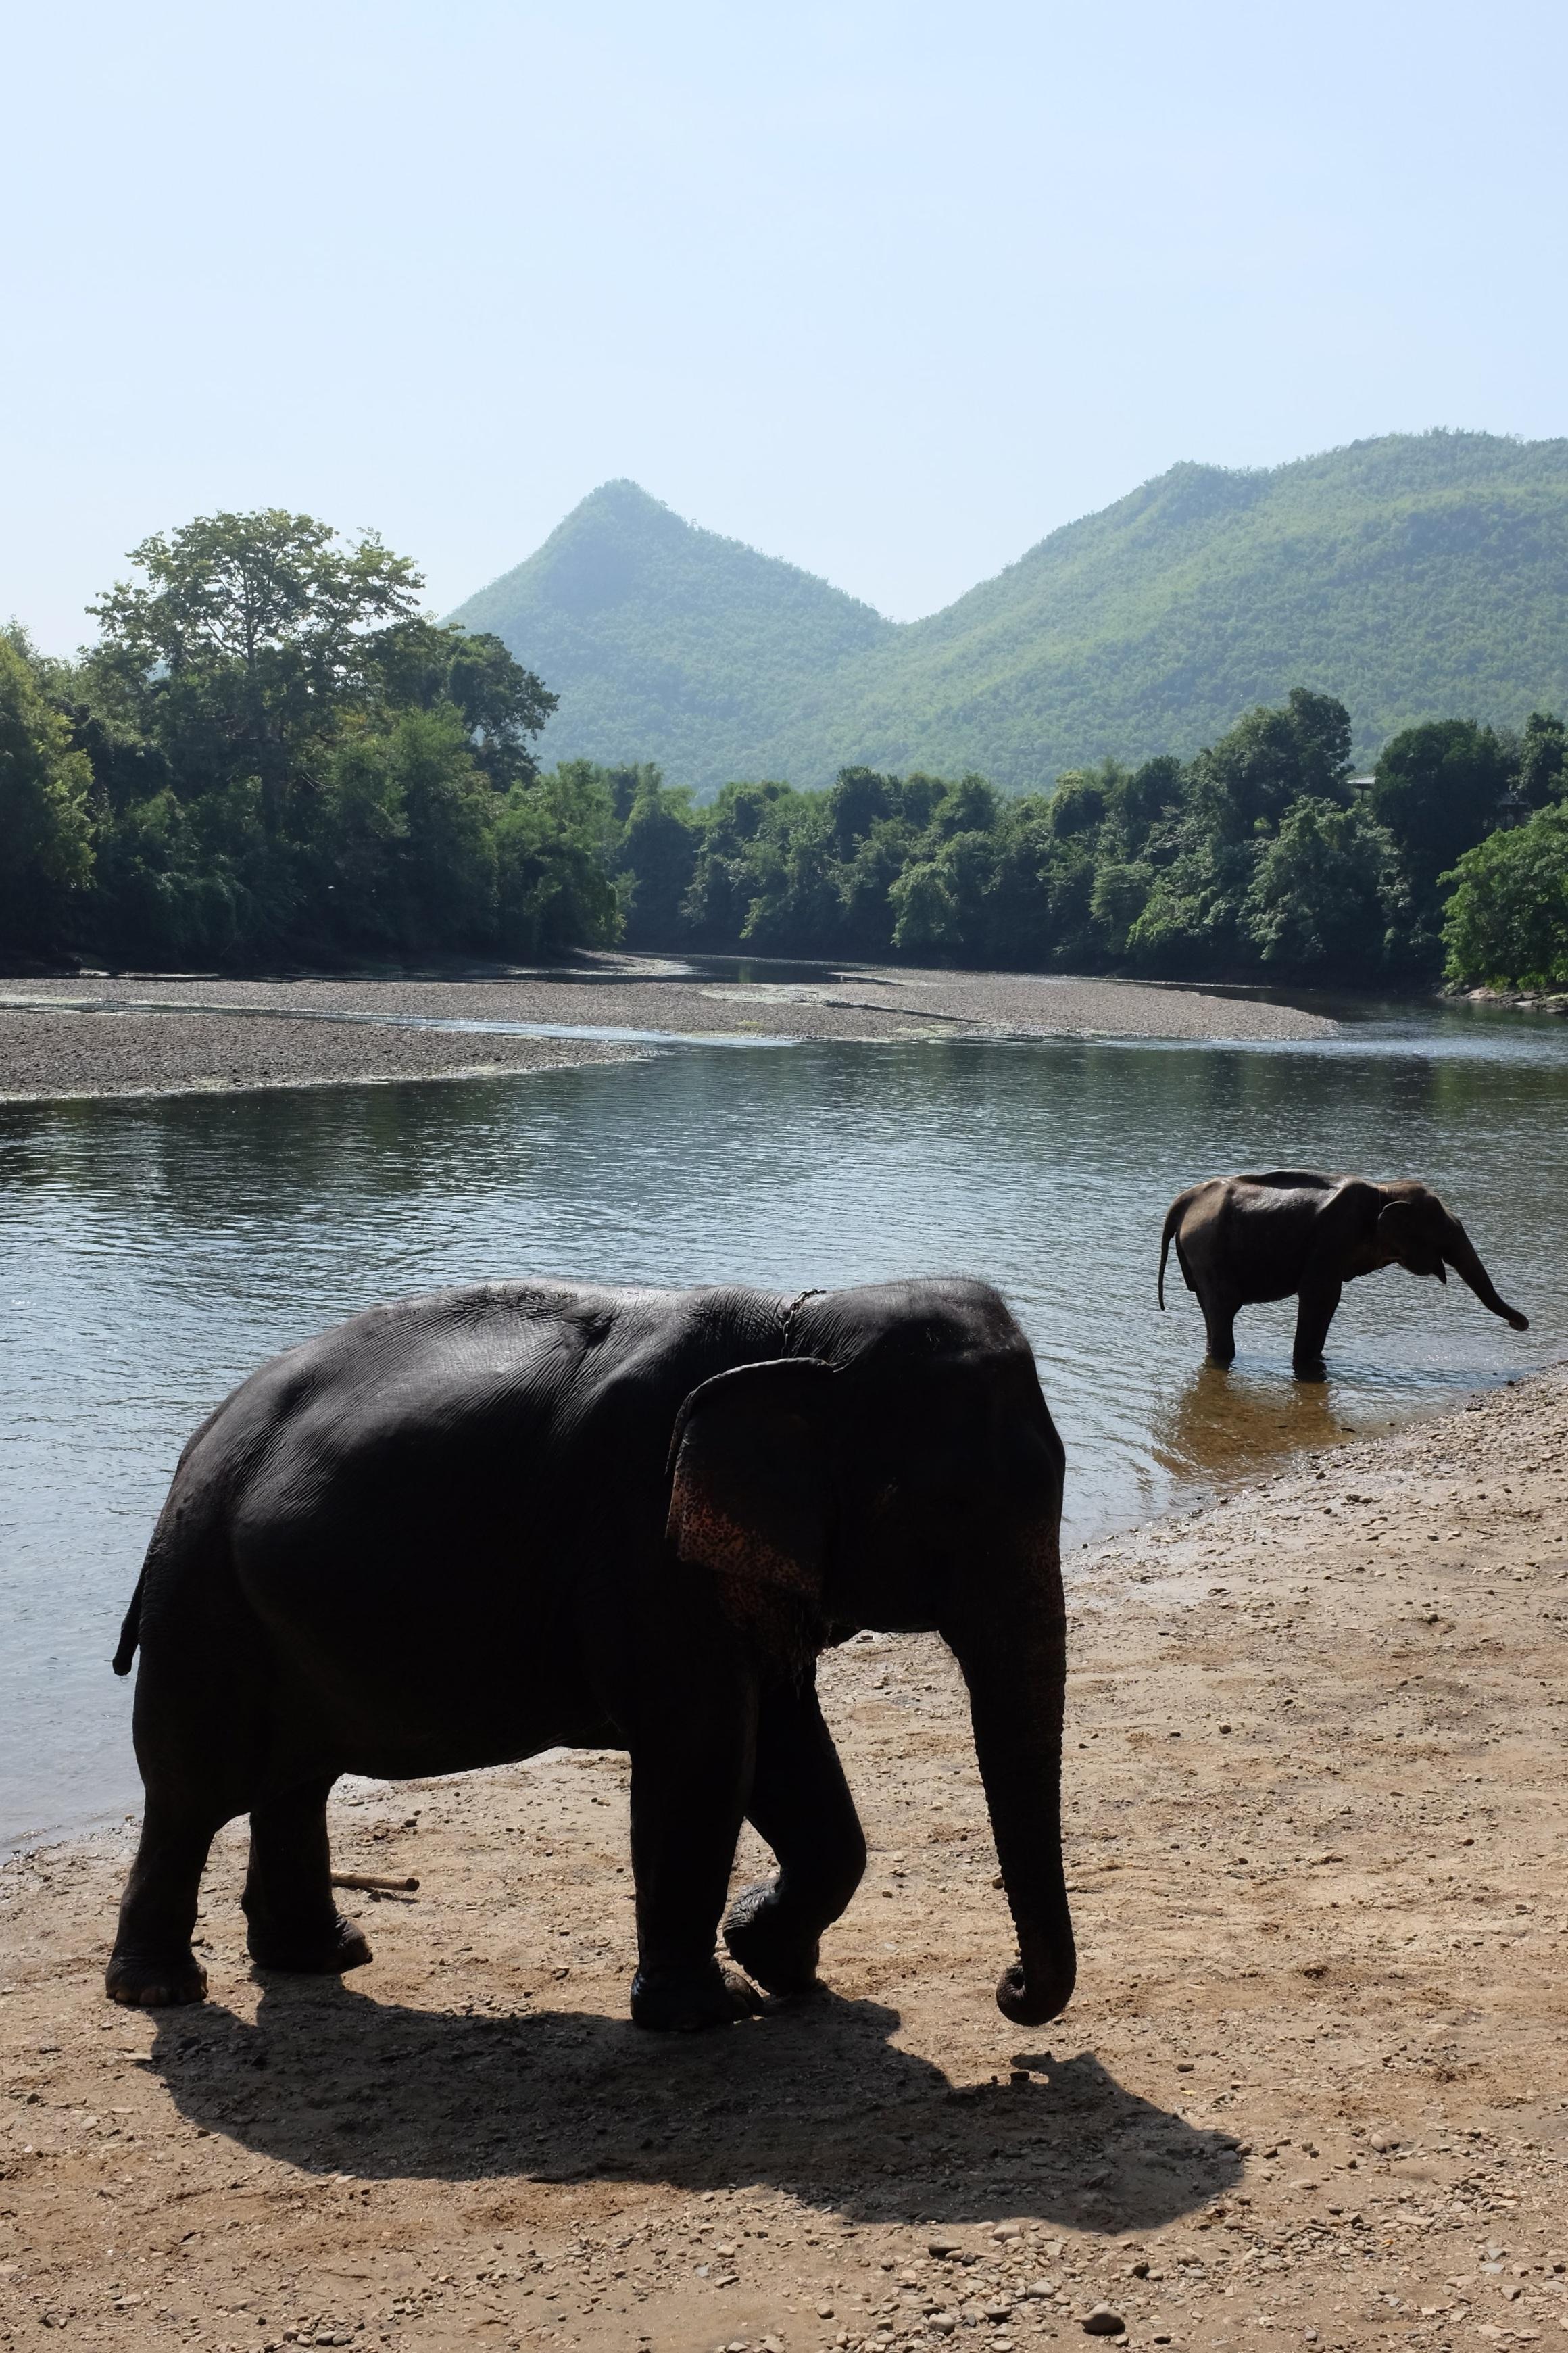 Elephants bathe in the river.